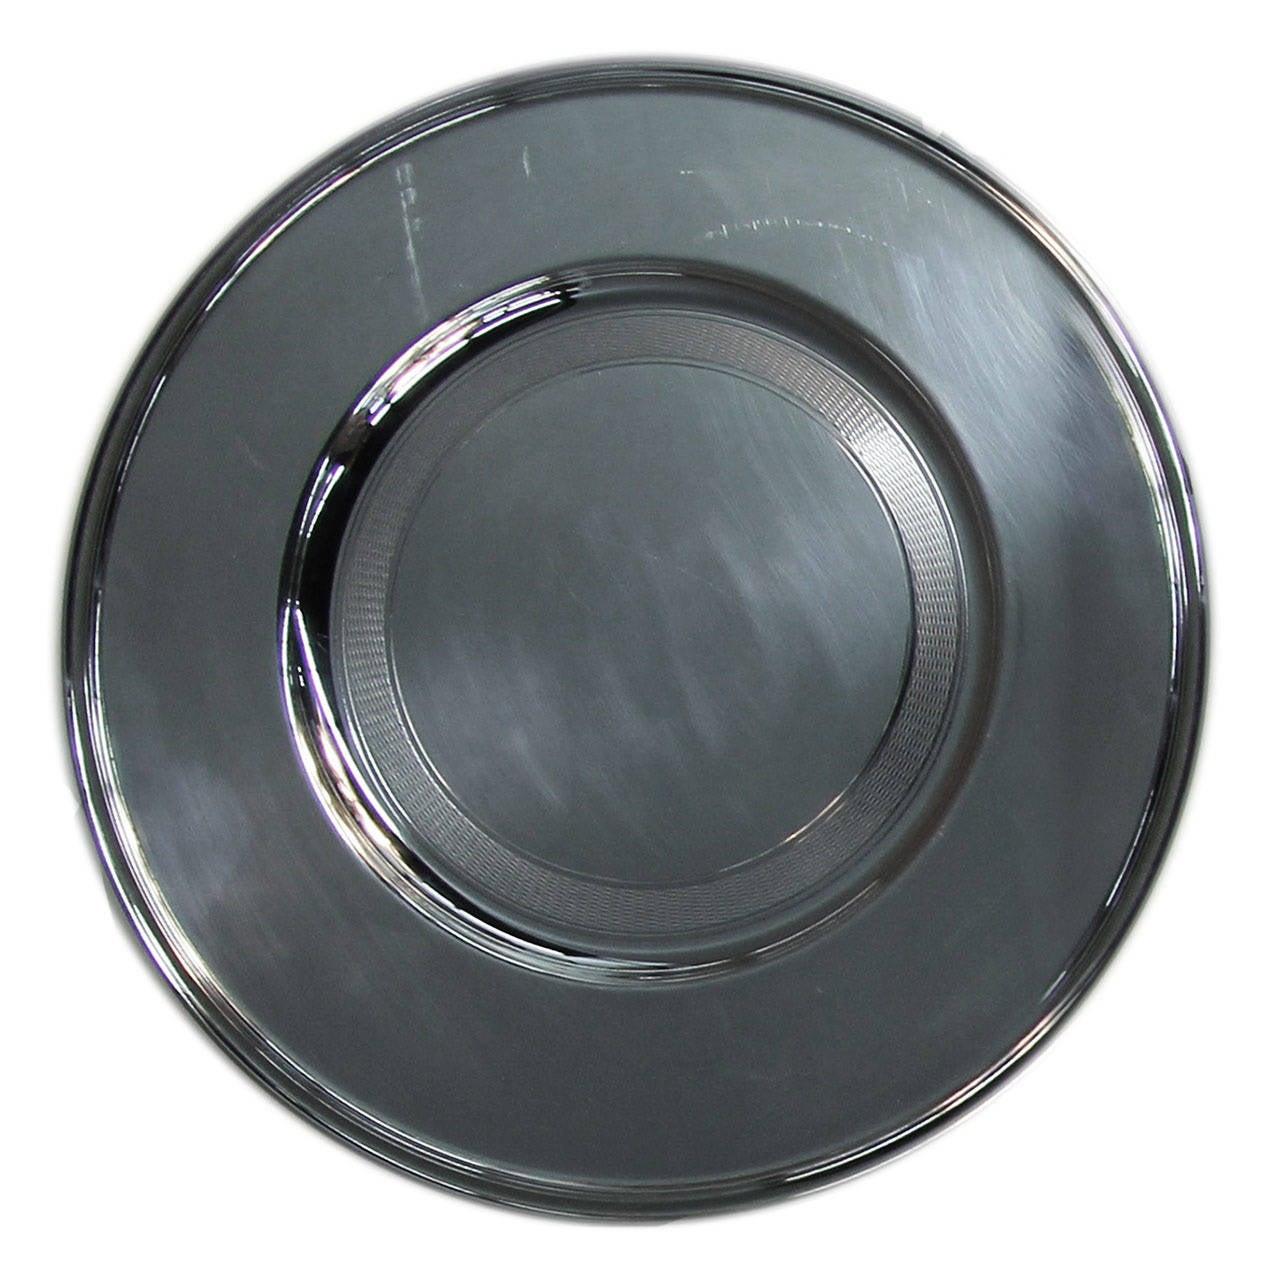 set of six christofle silver plated under plates at 1stdibs. Black Bedroom Furniture Sets. Home Design Ideas